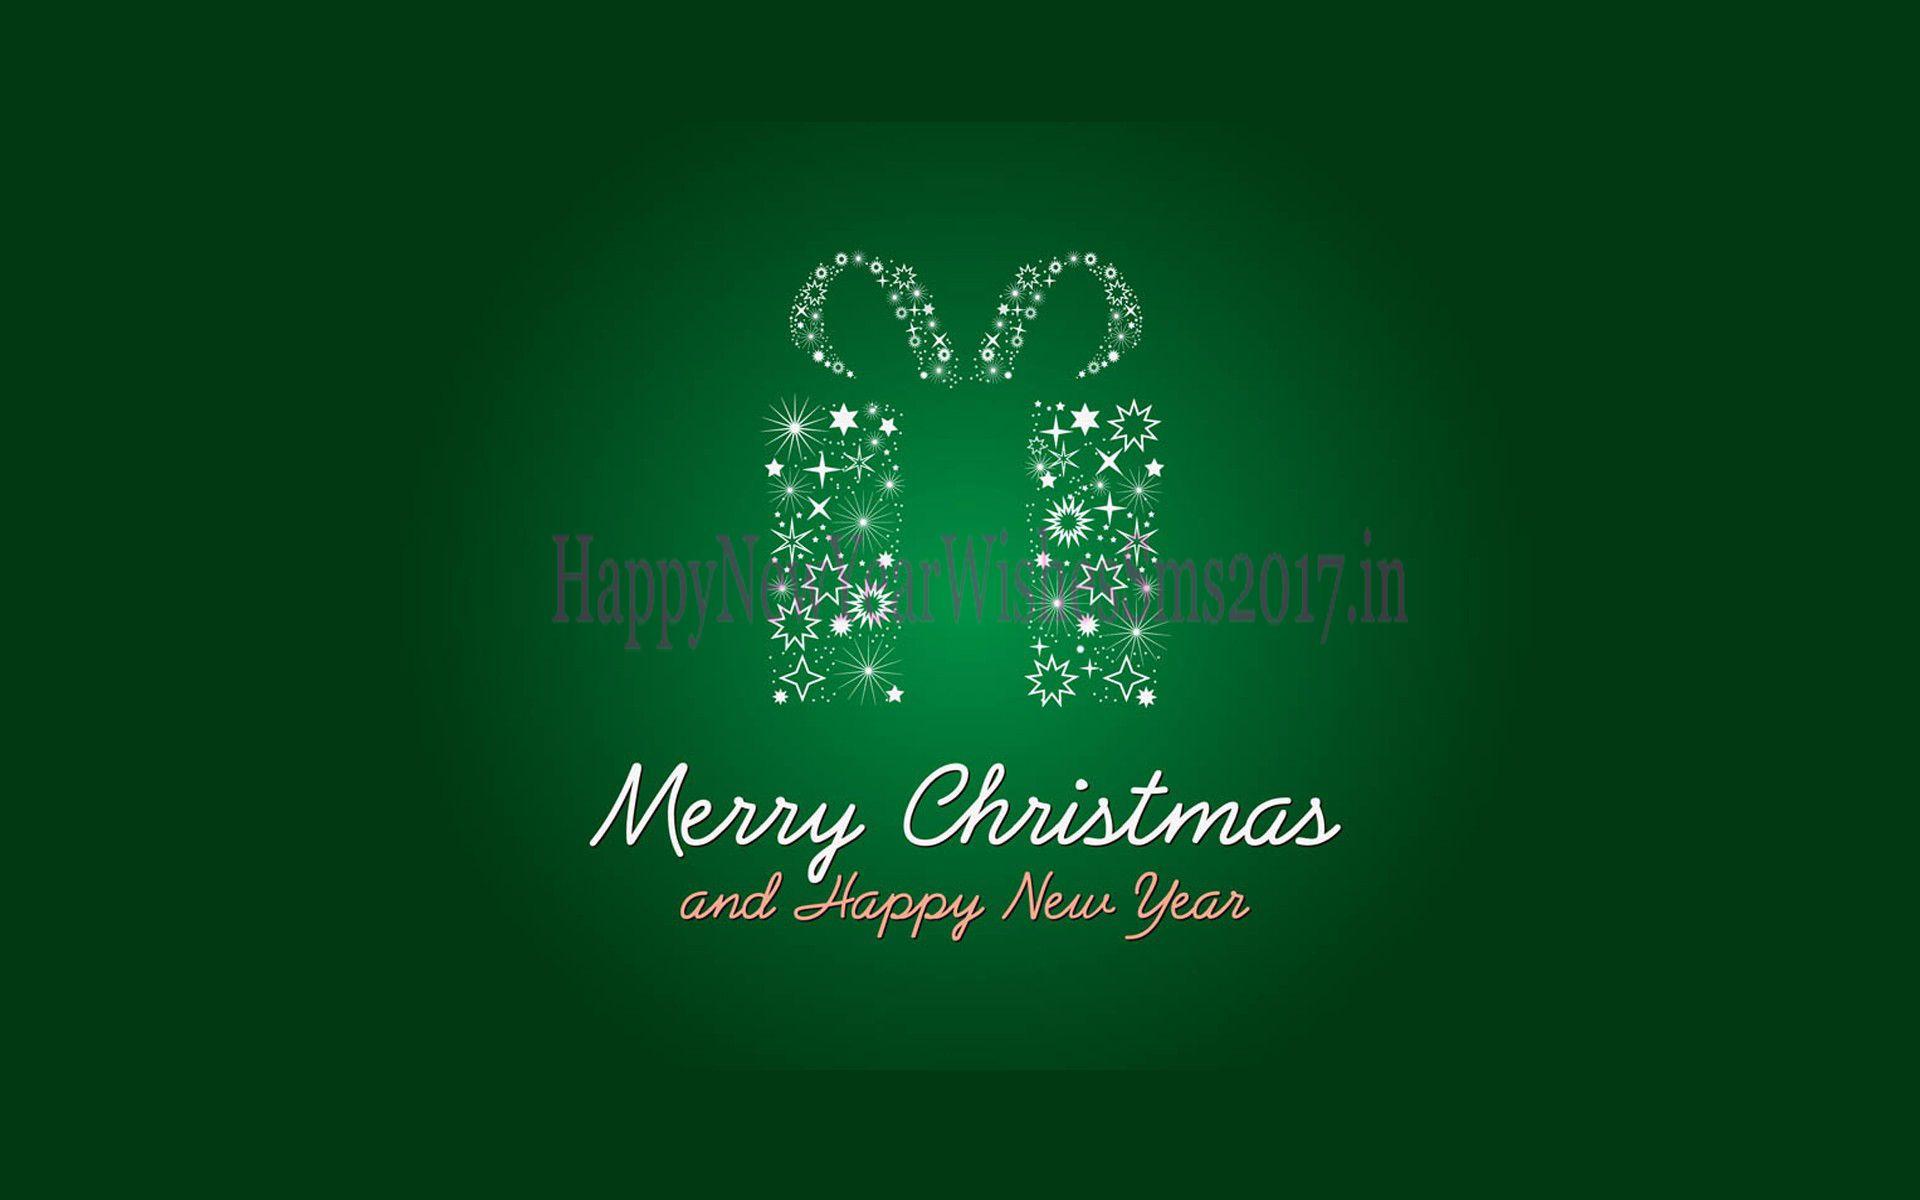 Merry Christmas Sms Christmas Greetings Merry Christmas Sms